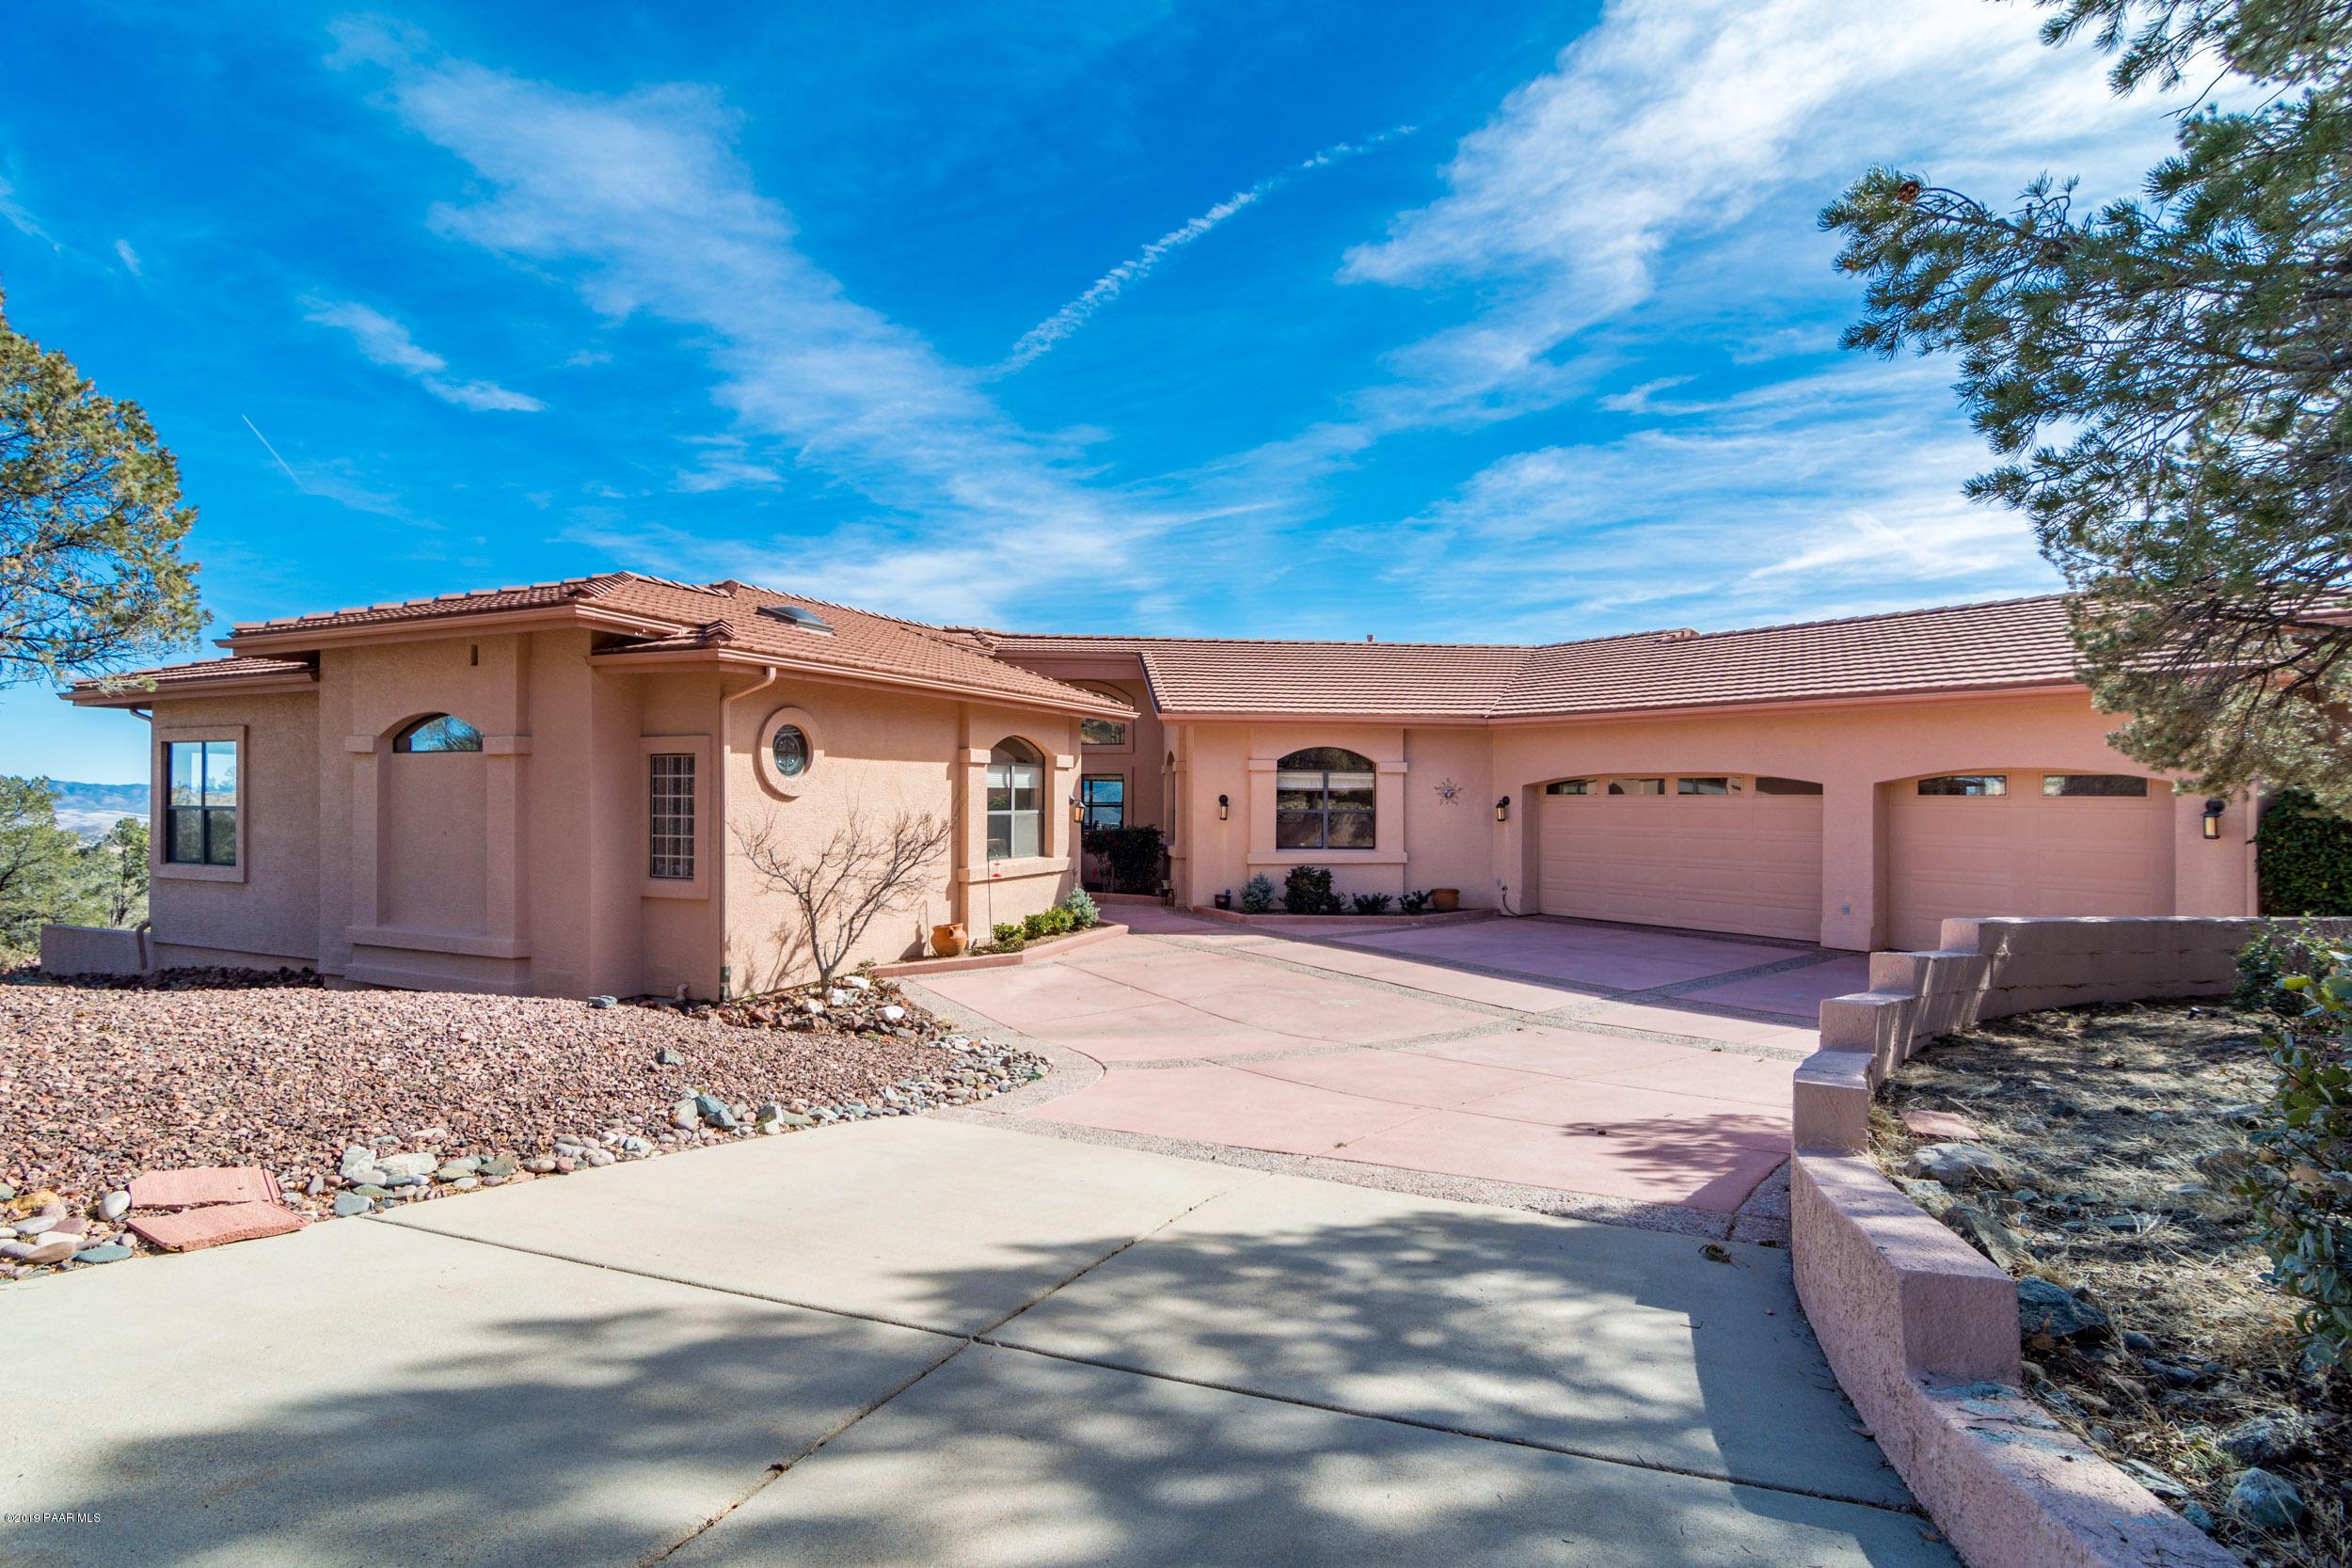 Photo of 561 Windspirit, Prescott, AZ 86303